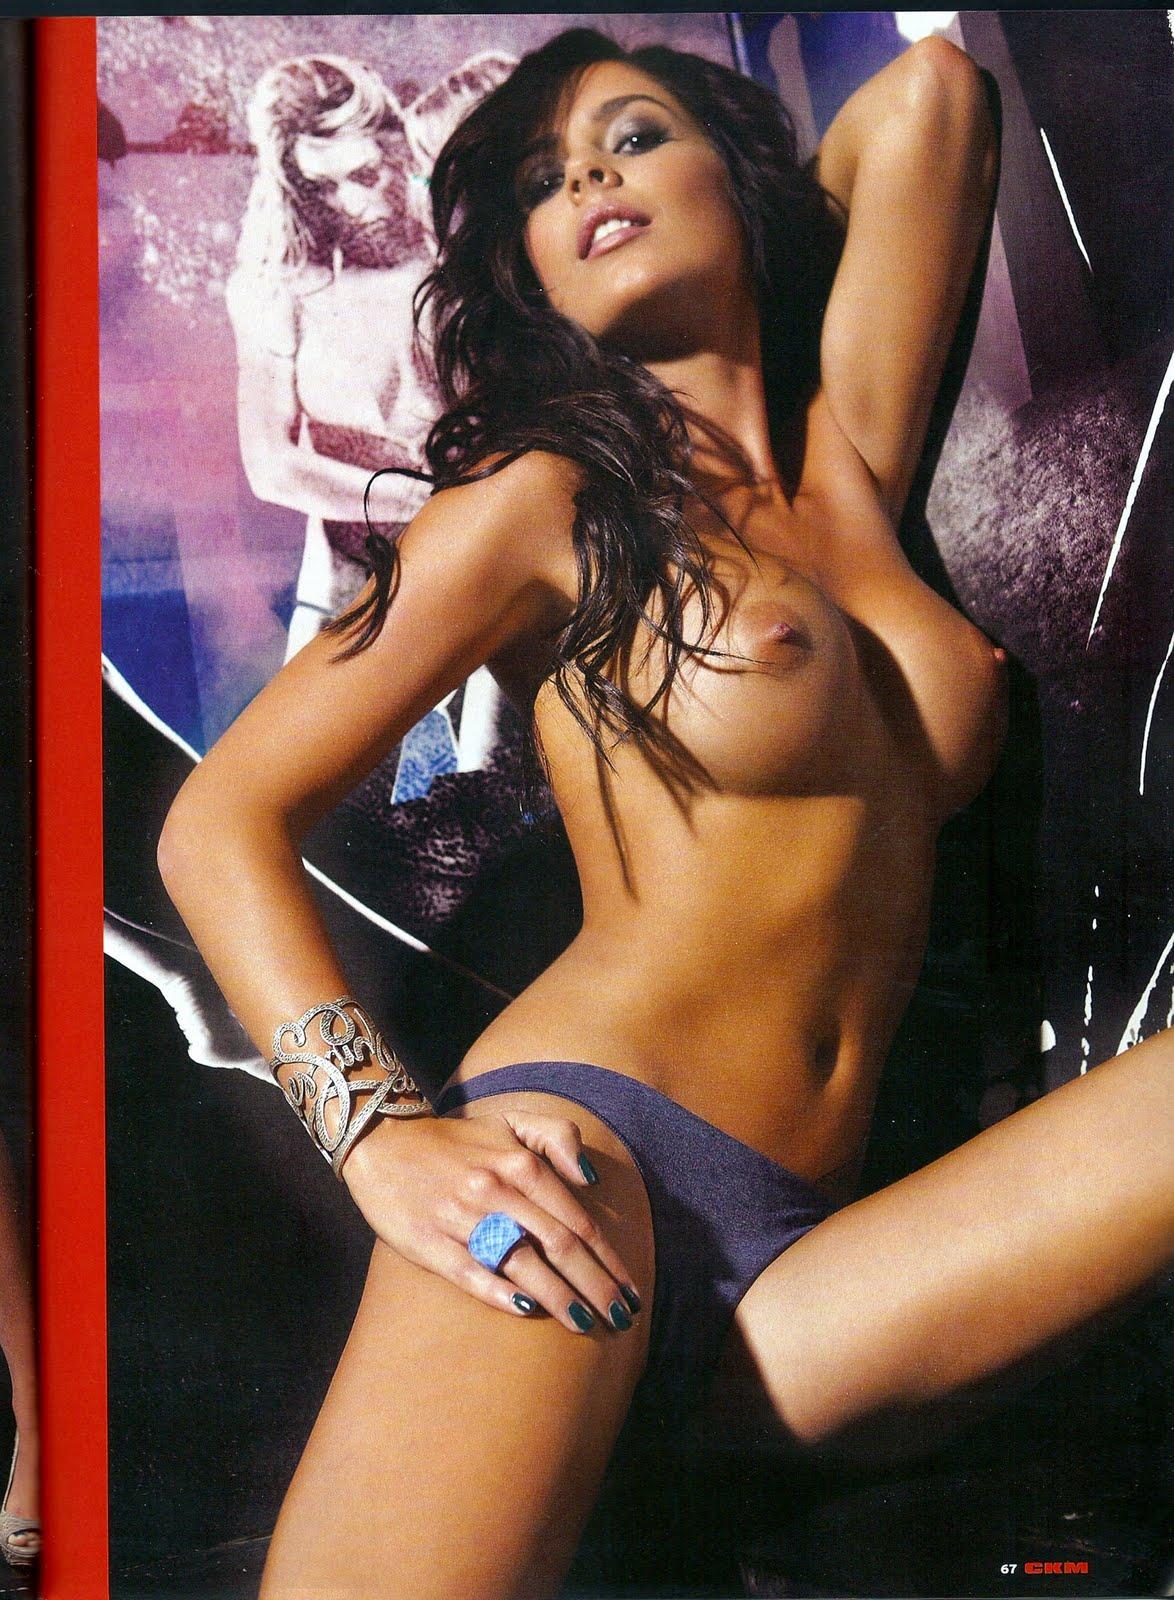 Jelena jensen Videos  Large PornTube Free tube porn